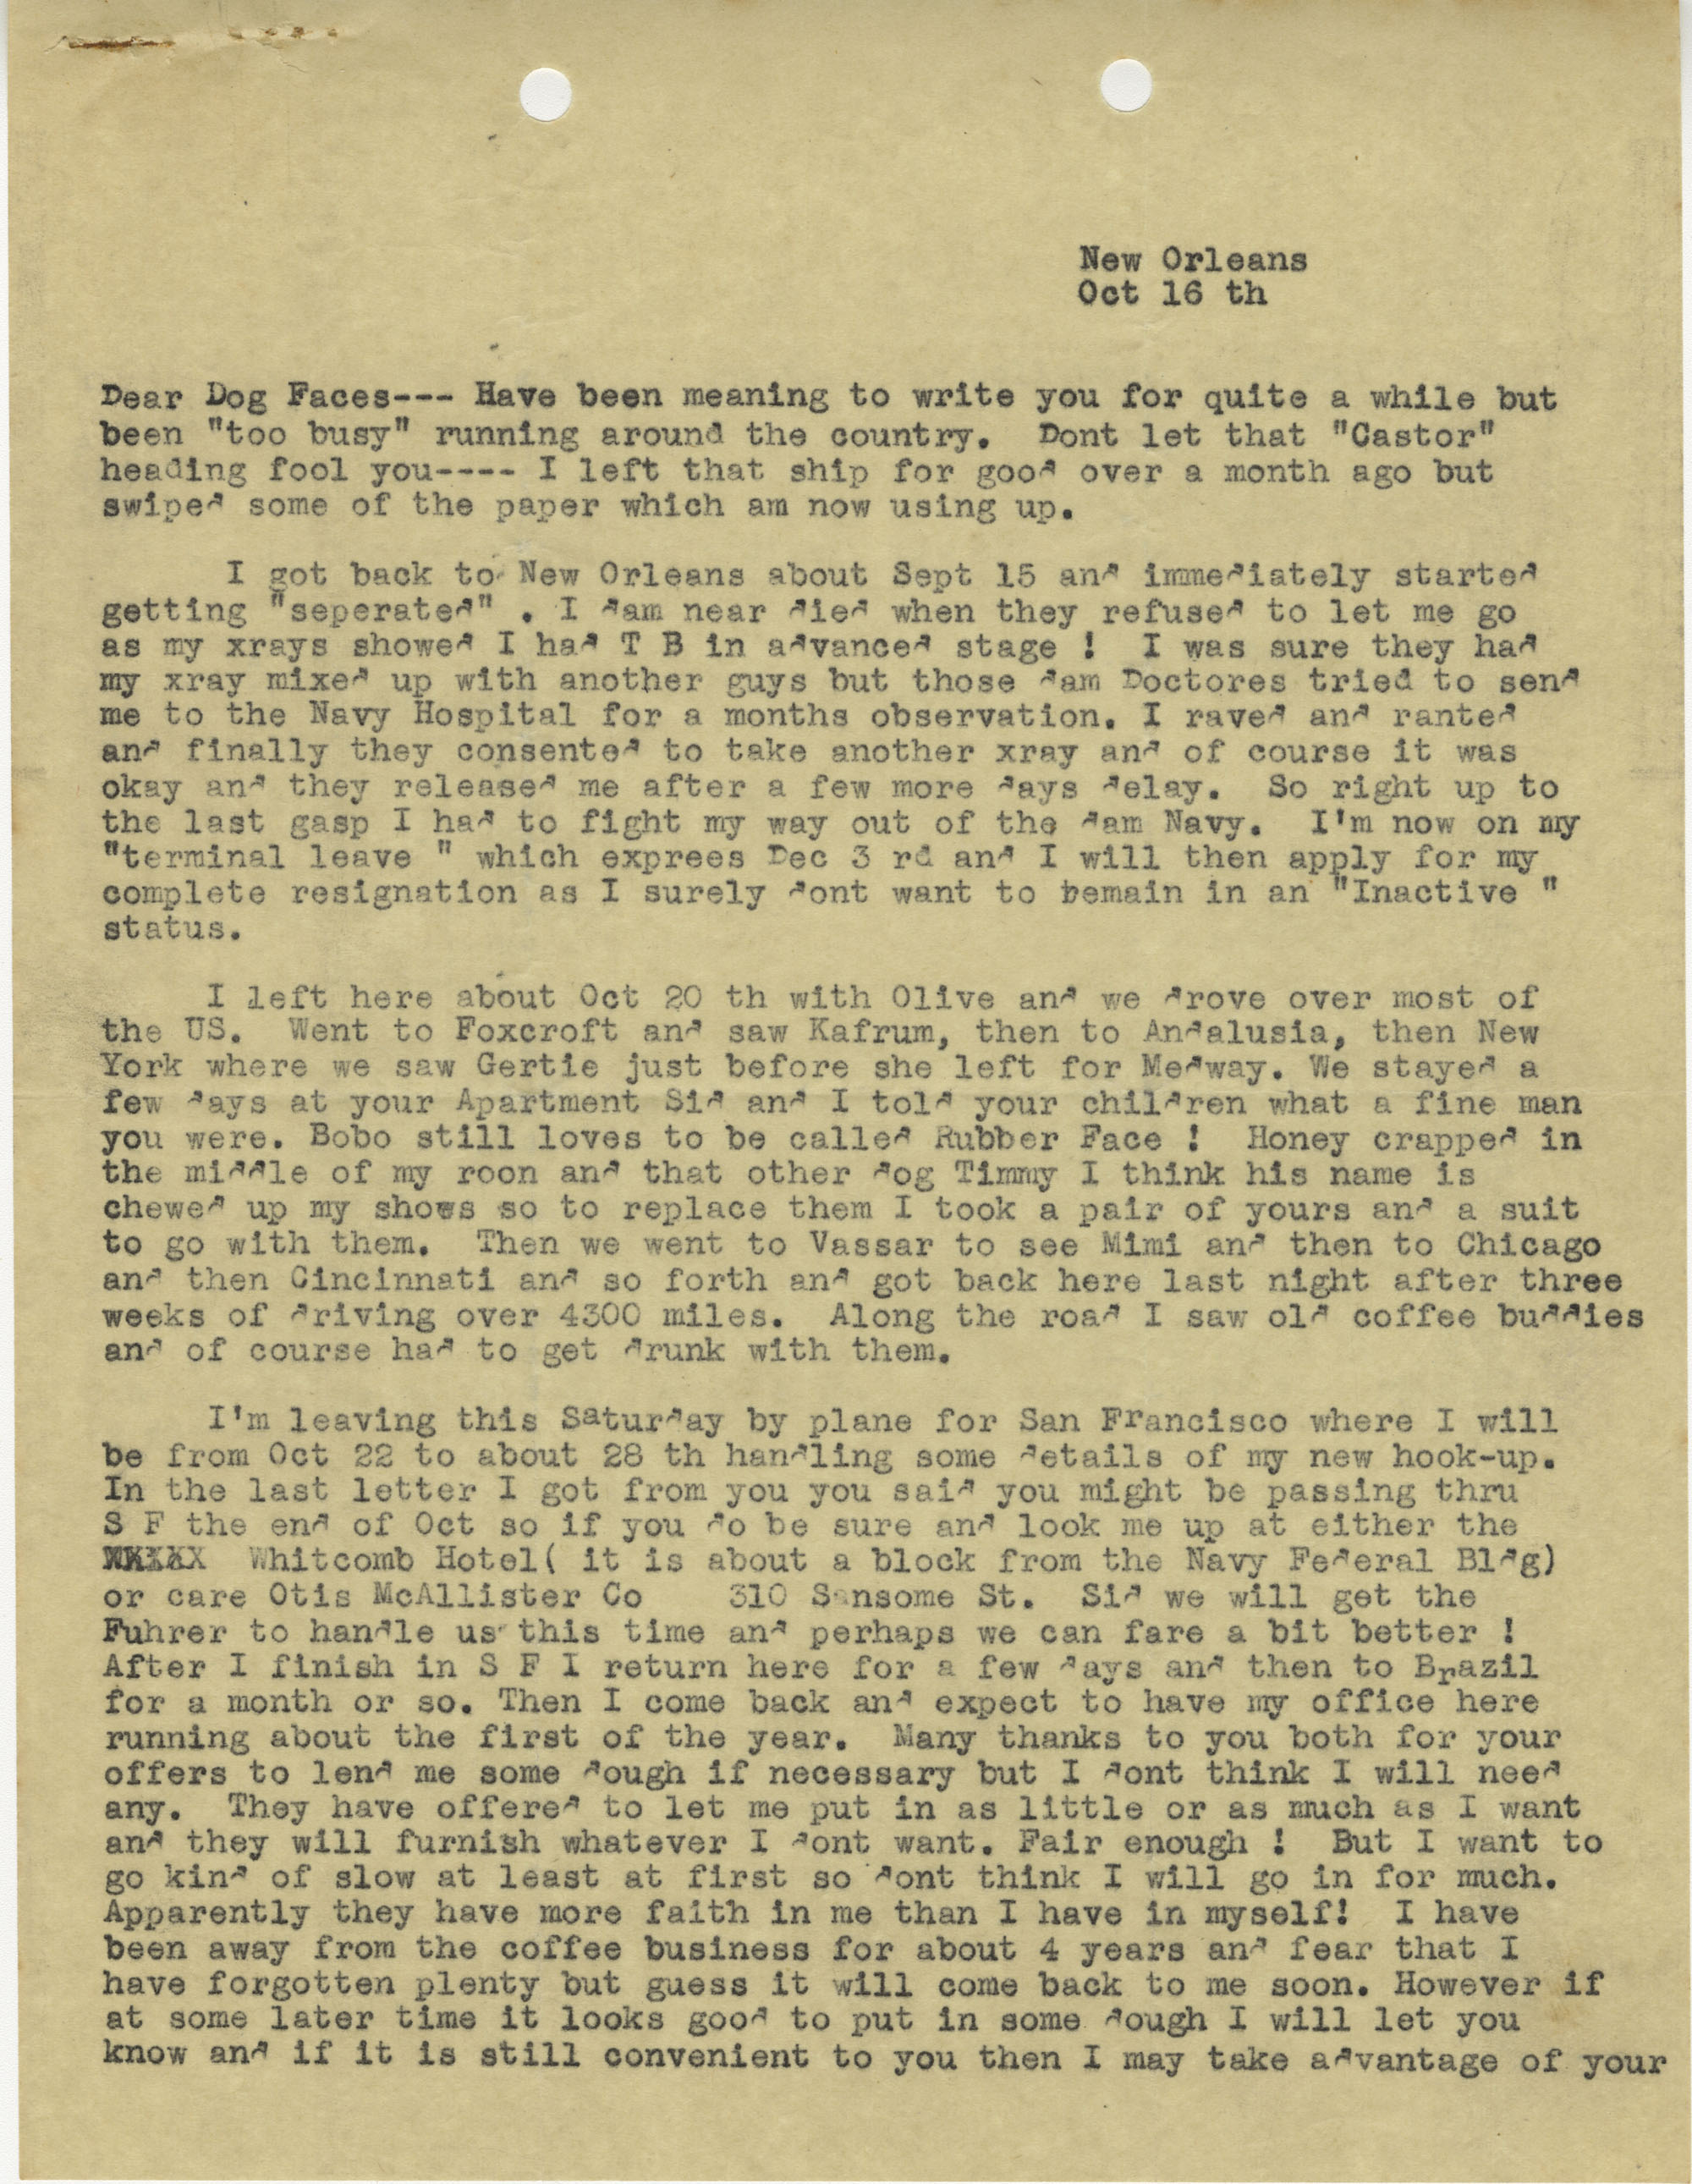 Letter from Armant Legendre, October 16, 1945